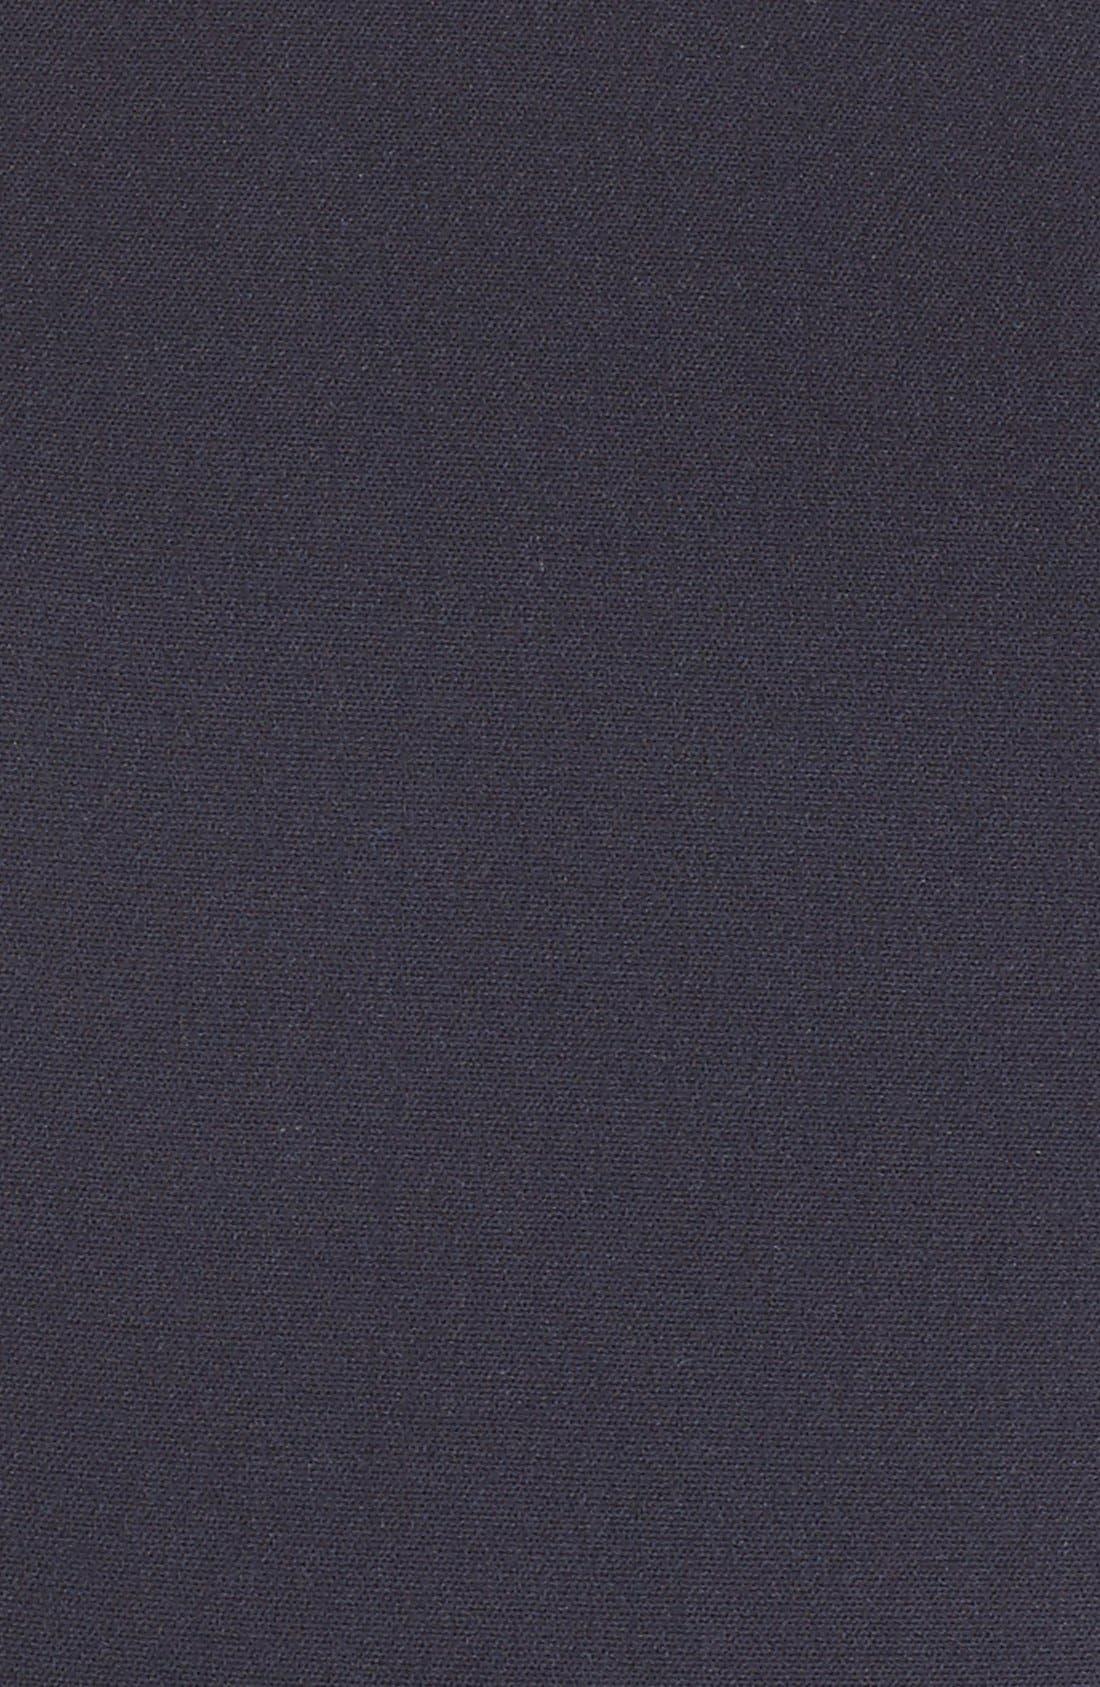 Cap Sleeve Crepe Sheath Dress,                             Alternate thumbnail 5, color,                             Navy